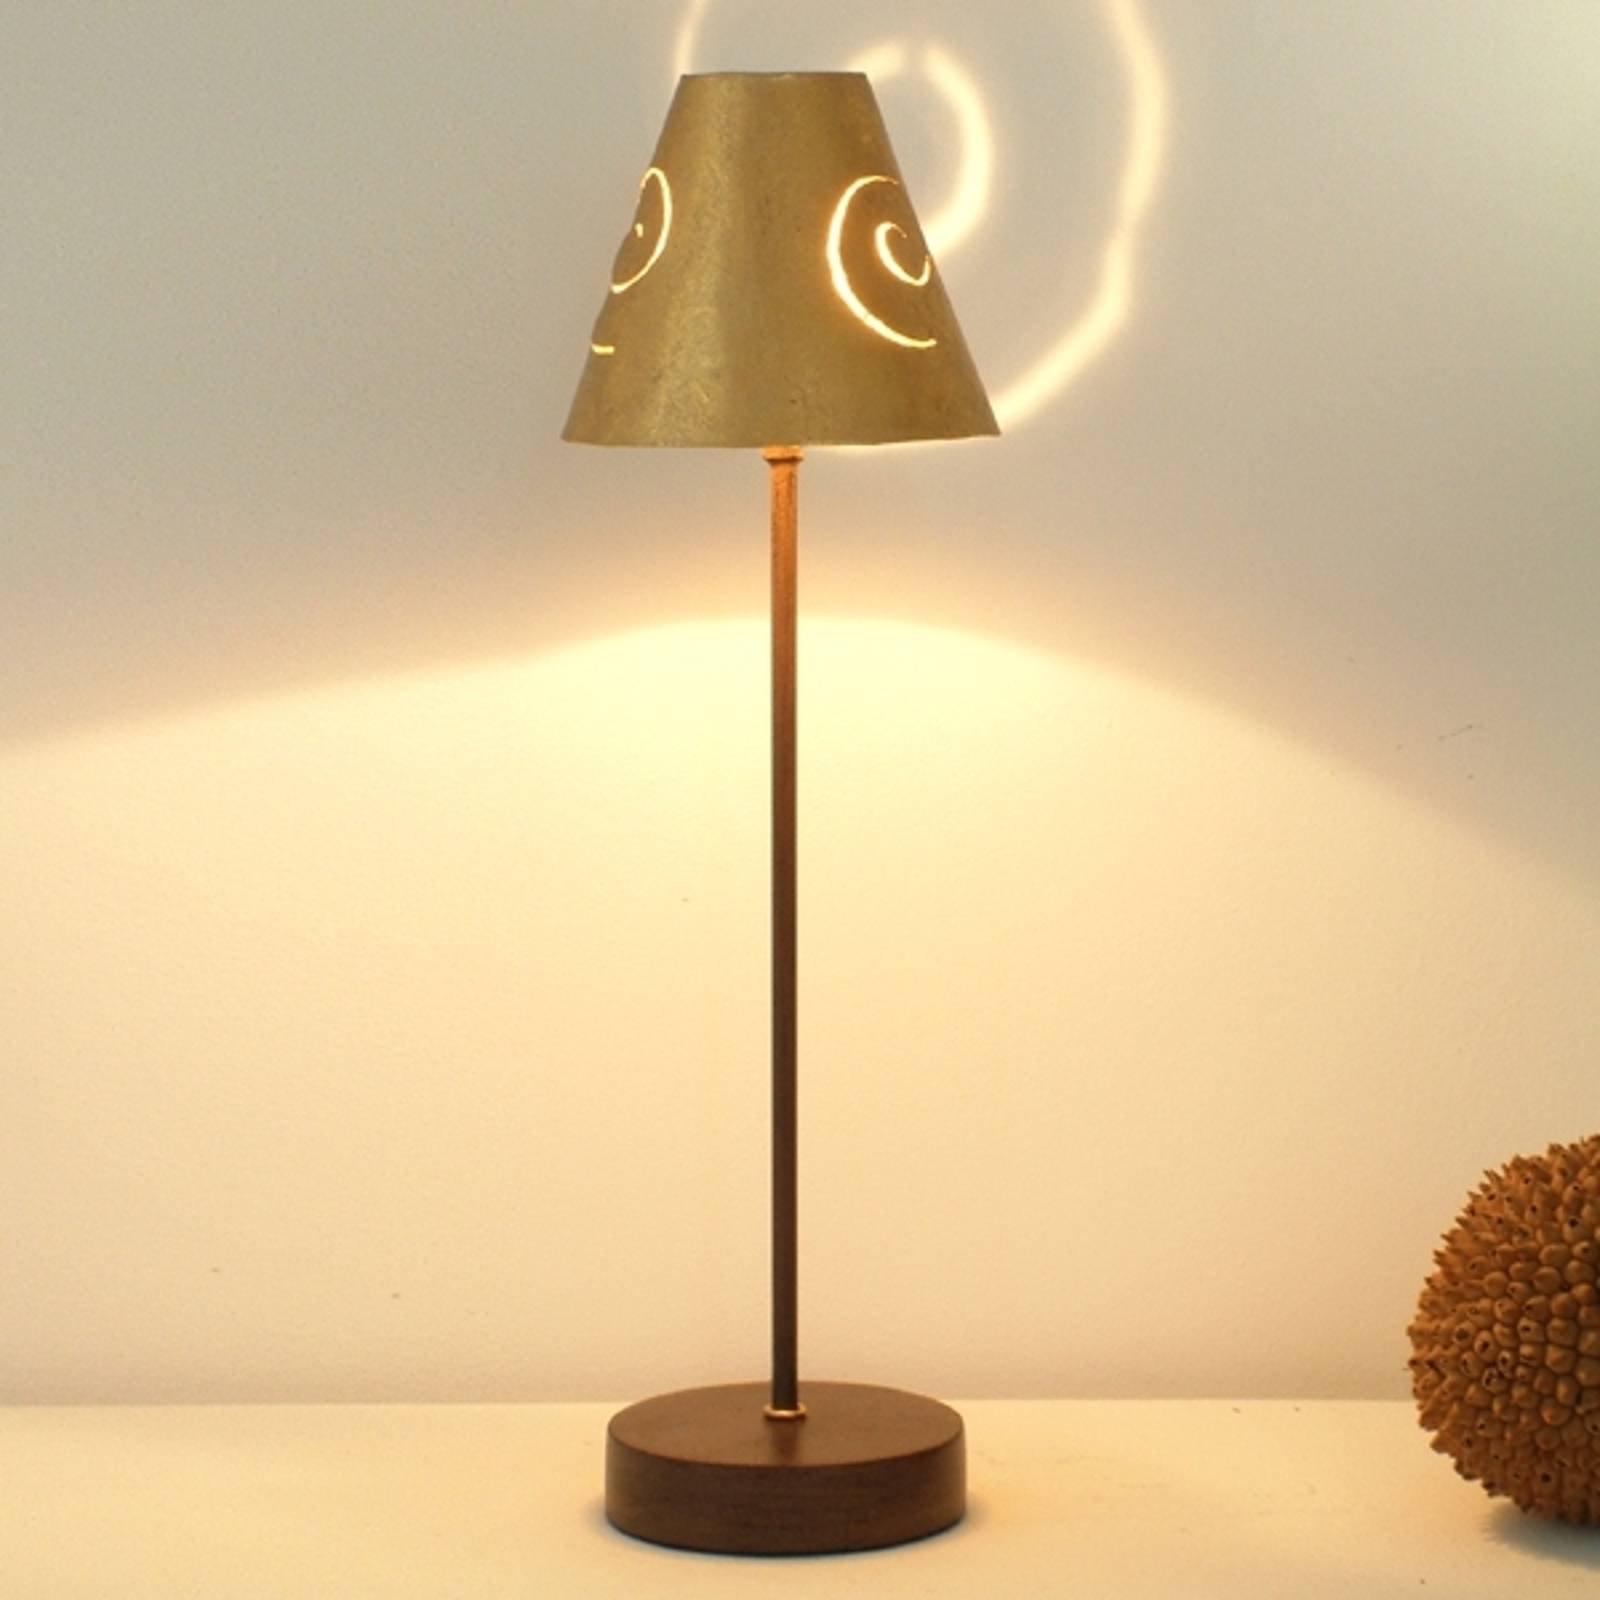 Elegant bordlampe Schneckenhut Gold av jern